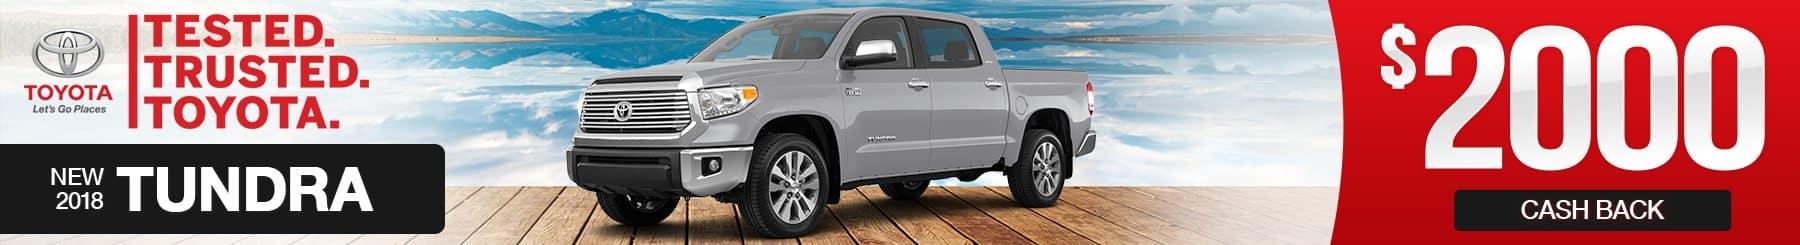 Toyota-Tundra-Finance-Special